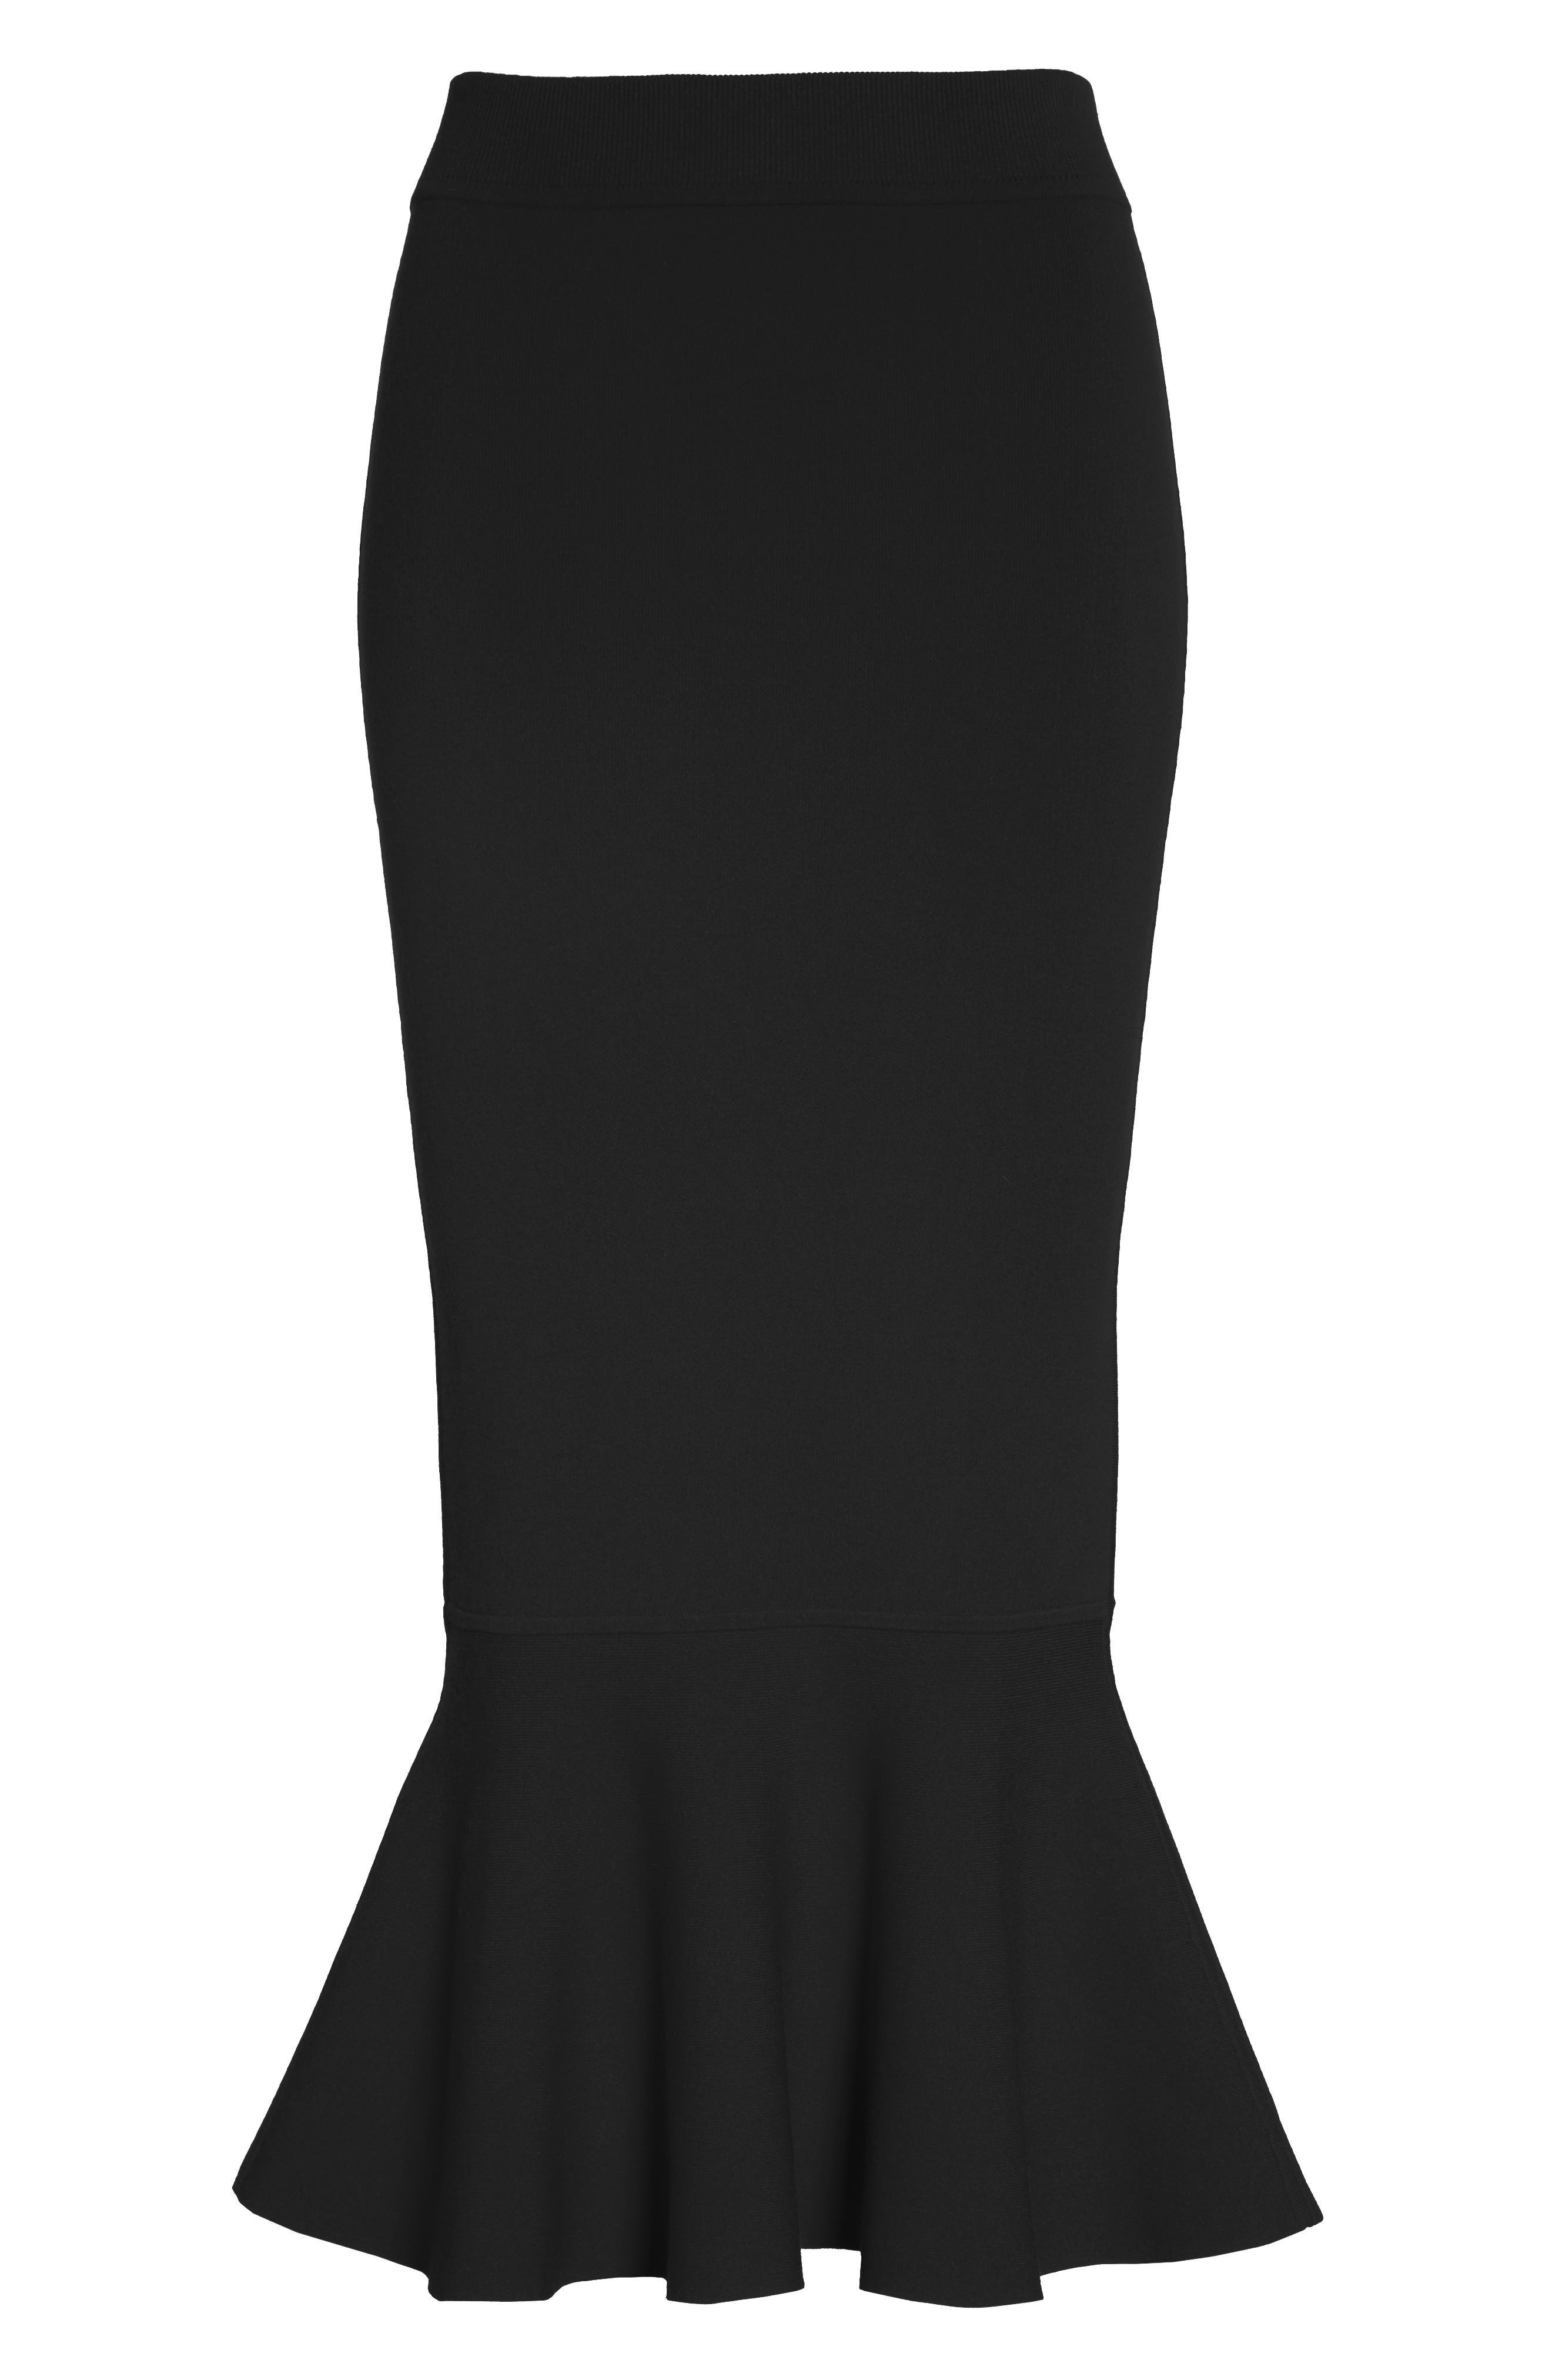 Alternate Image 4  - Michael Kors Stretch Knit Flounce Skirt